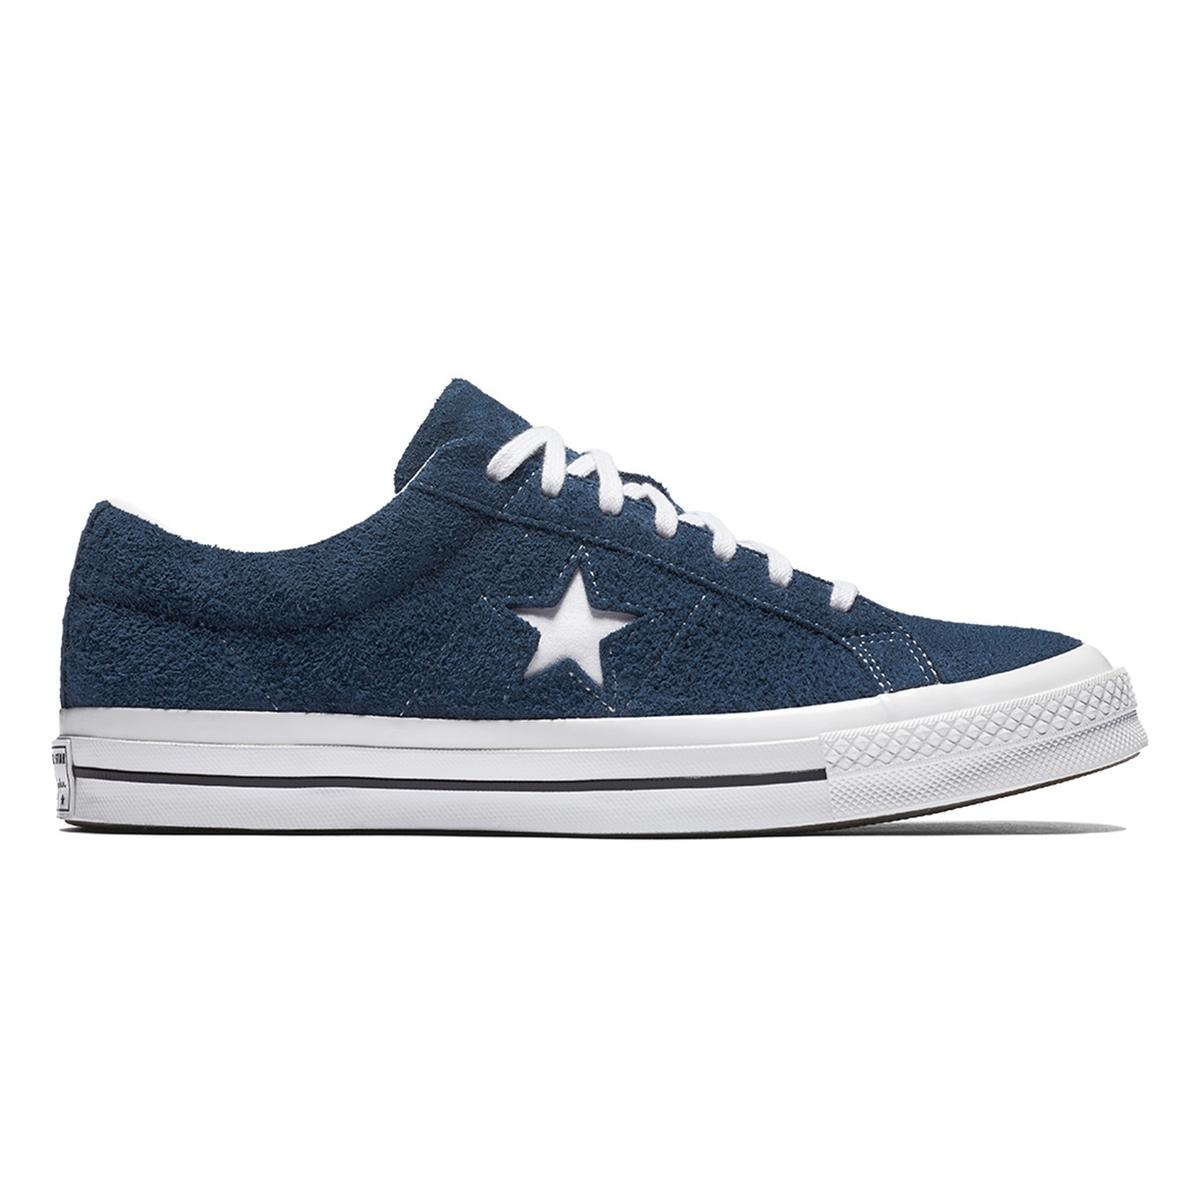 Zapatillas bajas One Star OG Suede